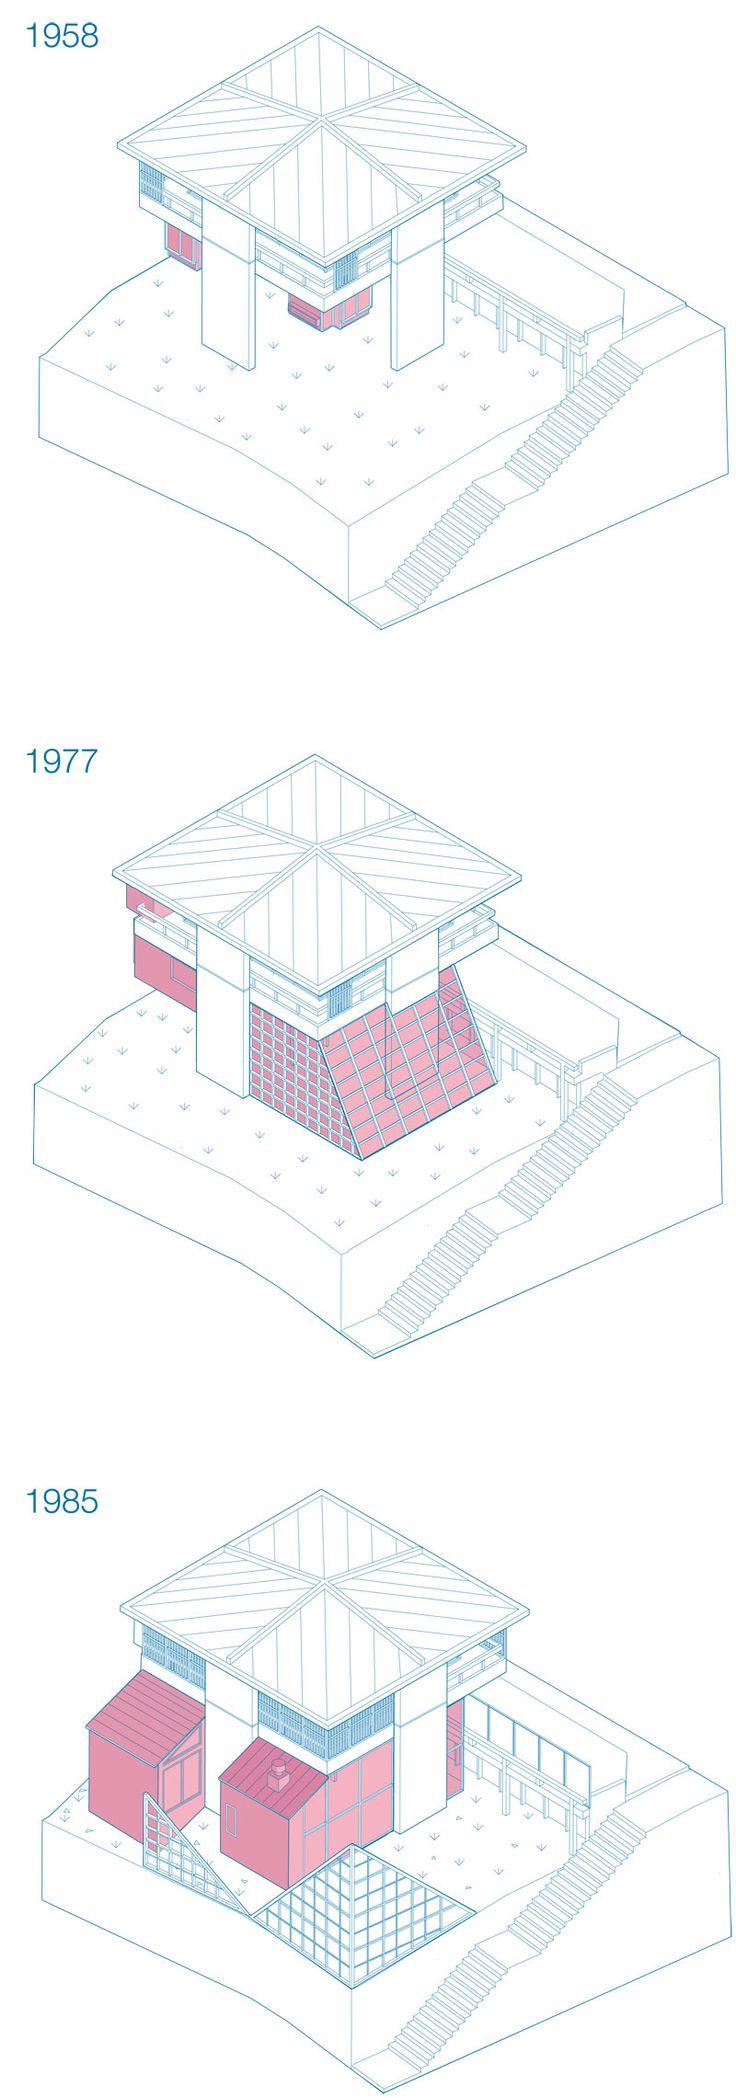 Evolutionary Housescape: the Metabolist Sky House by Kiyonori Kikutake (1958)